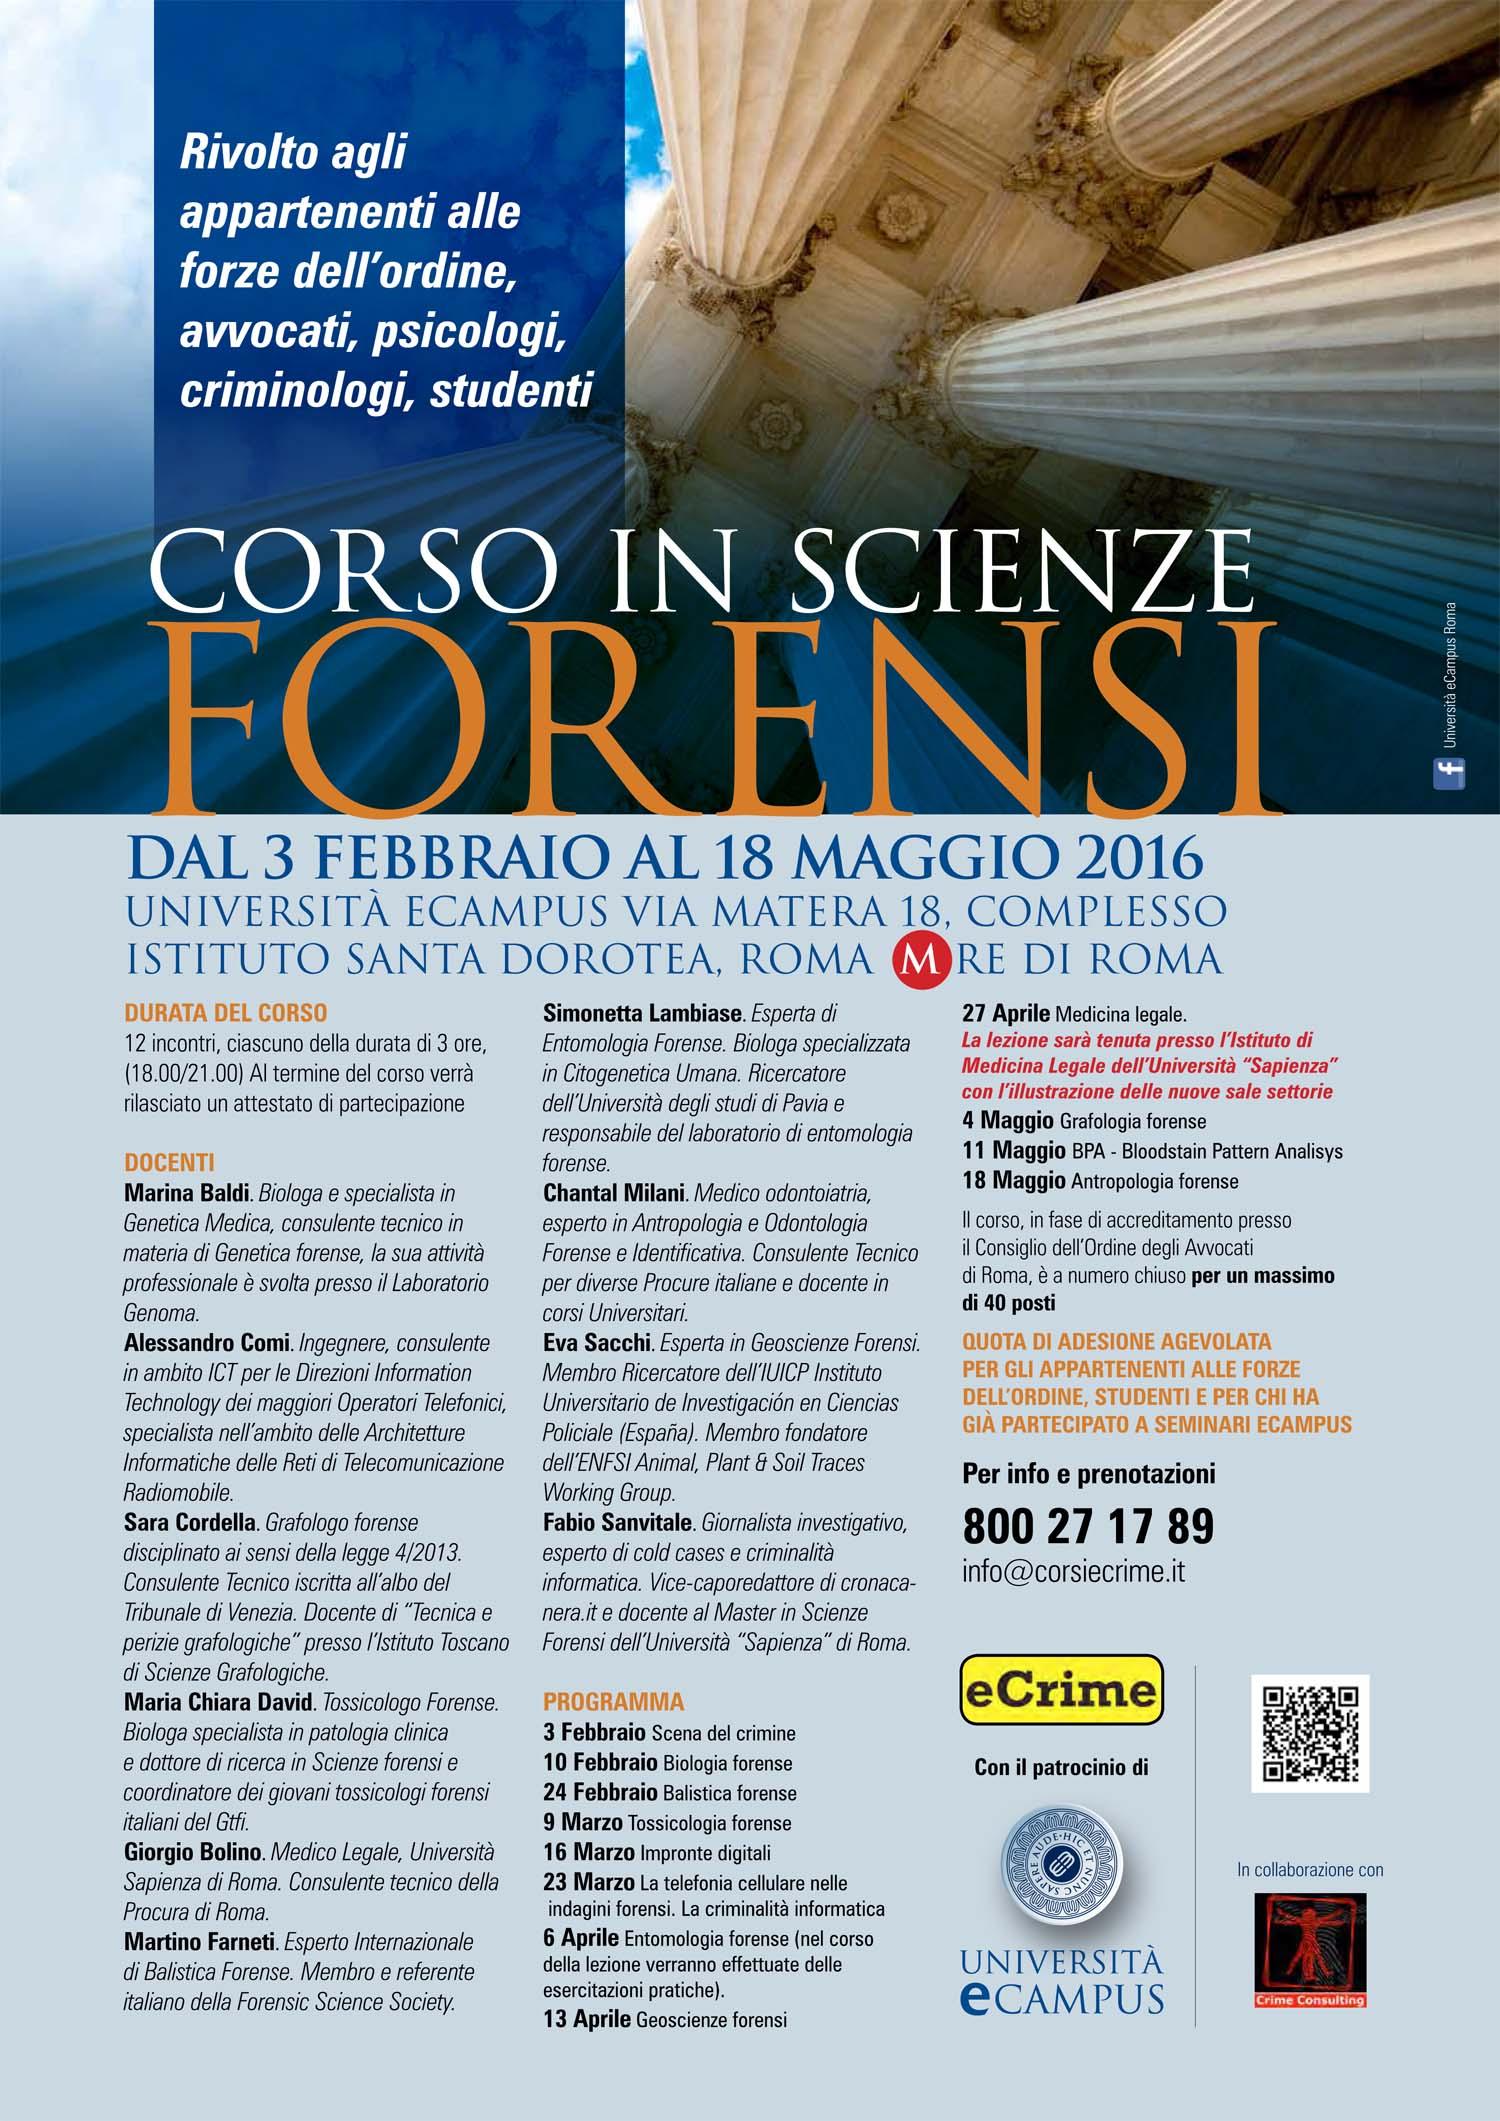 Corso in scienze Forensi 2016